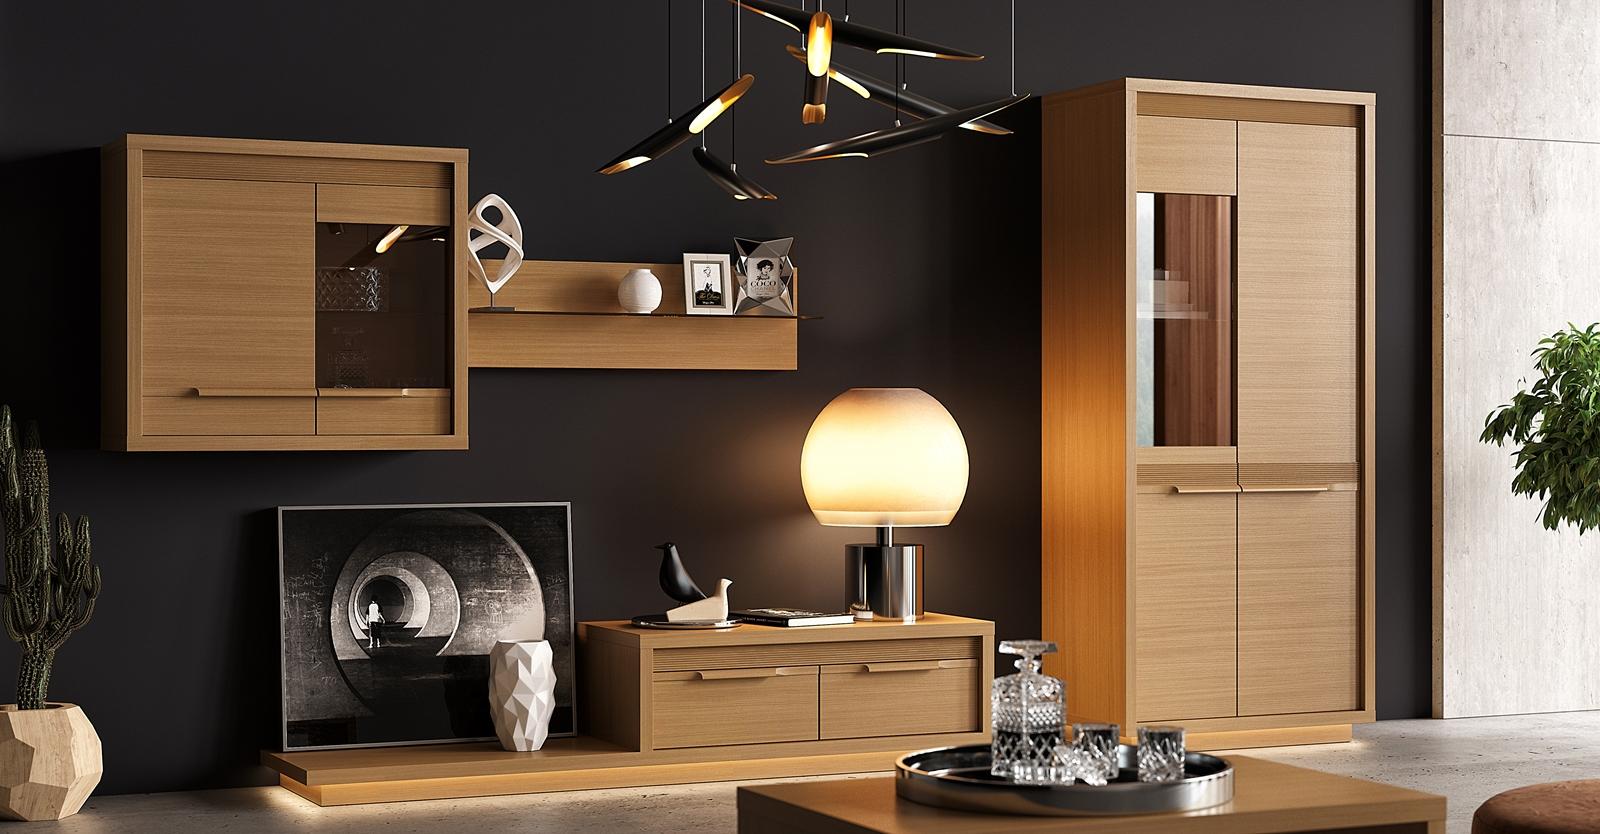 Living-room_01-1